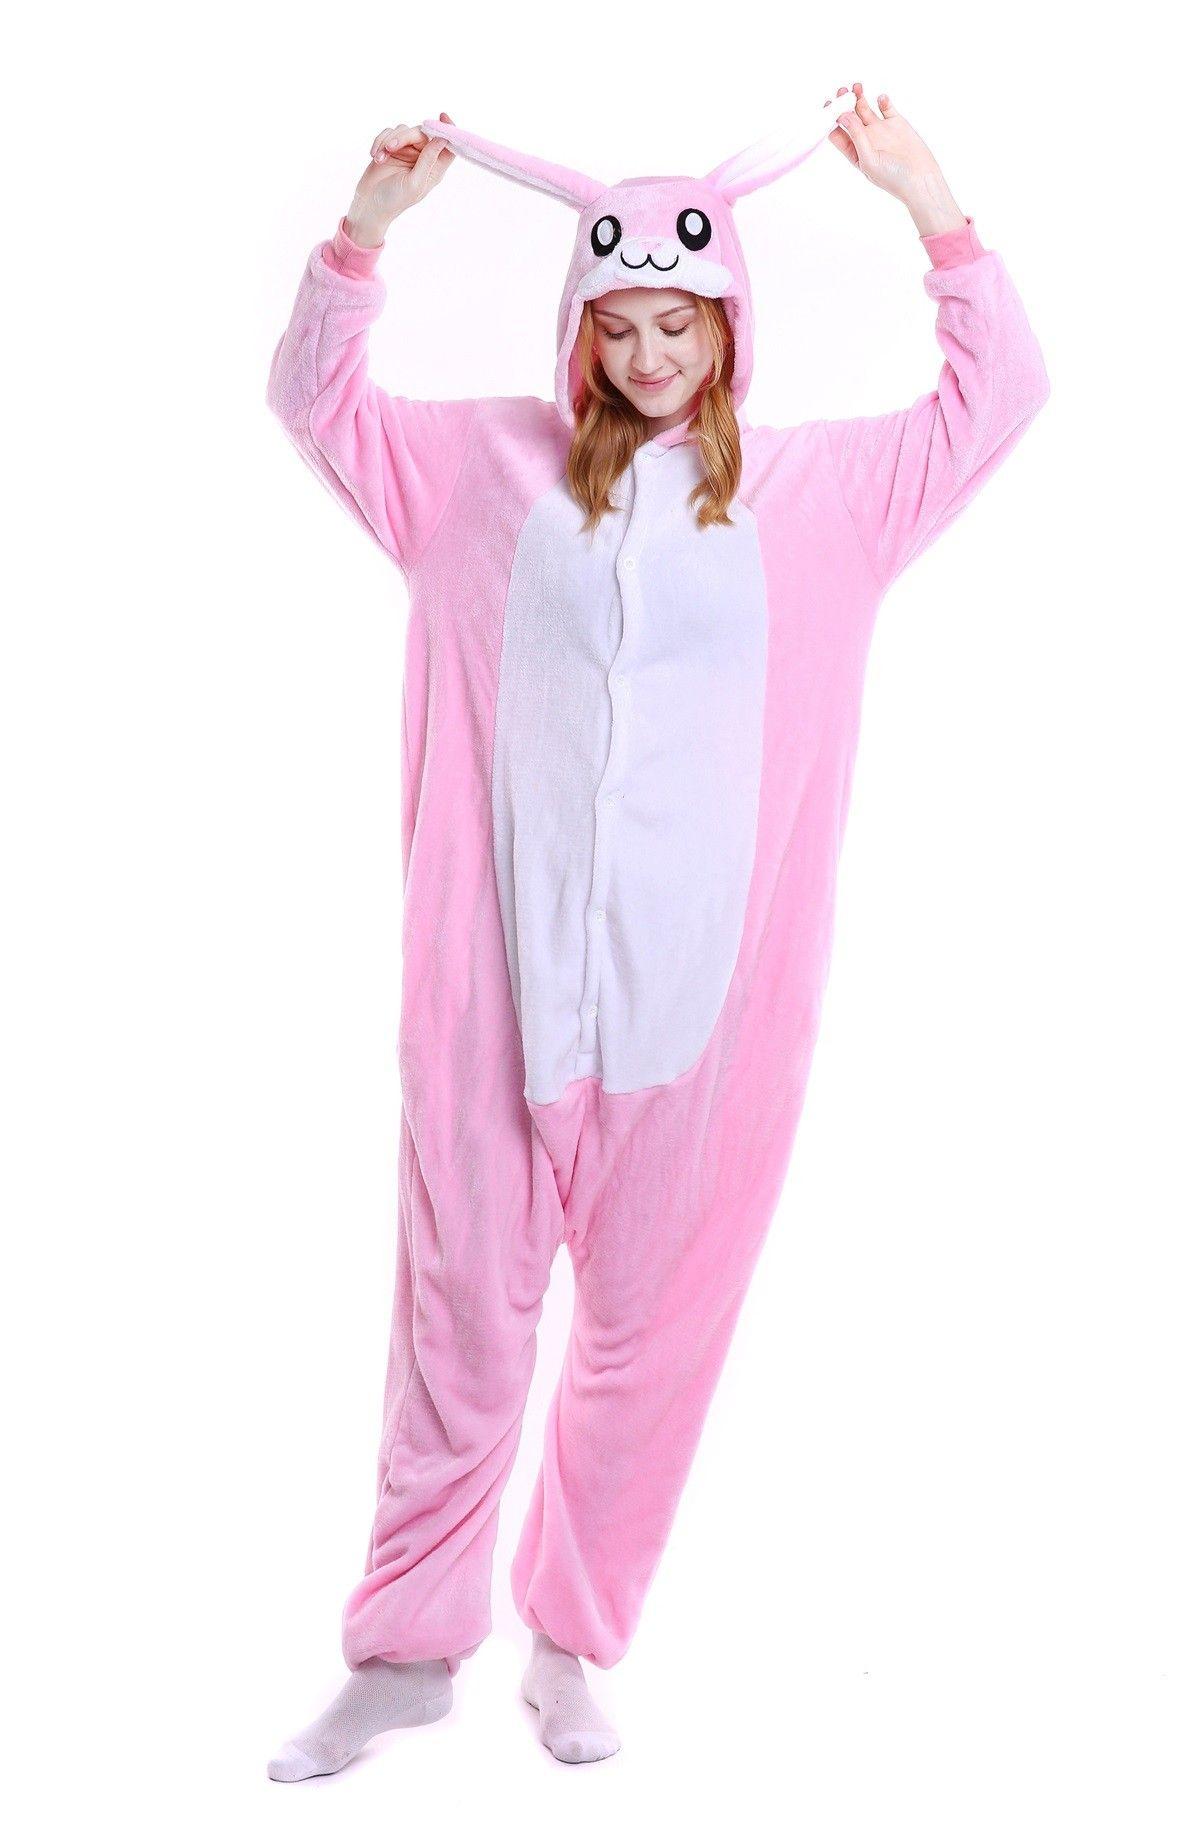 fb212604f kigurumi pink Rabbit onesies animal pajamas for adults